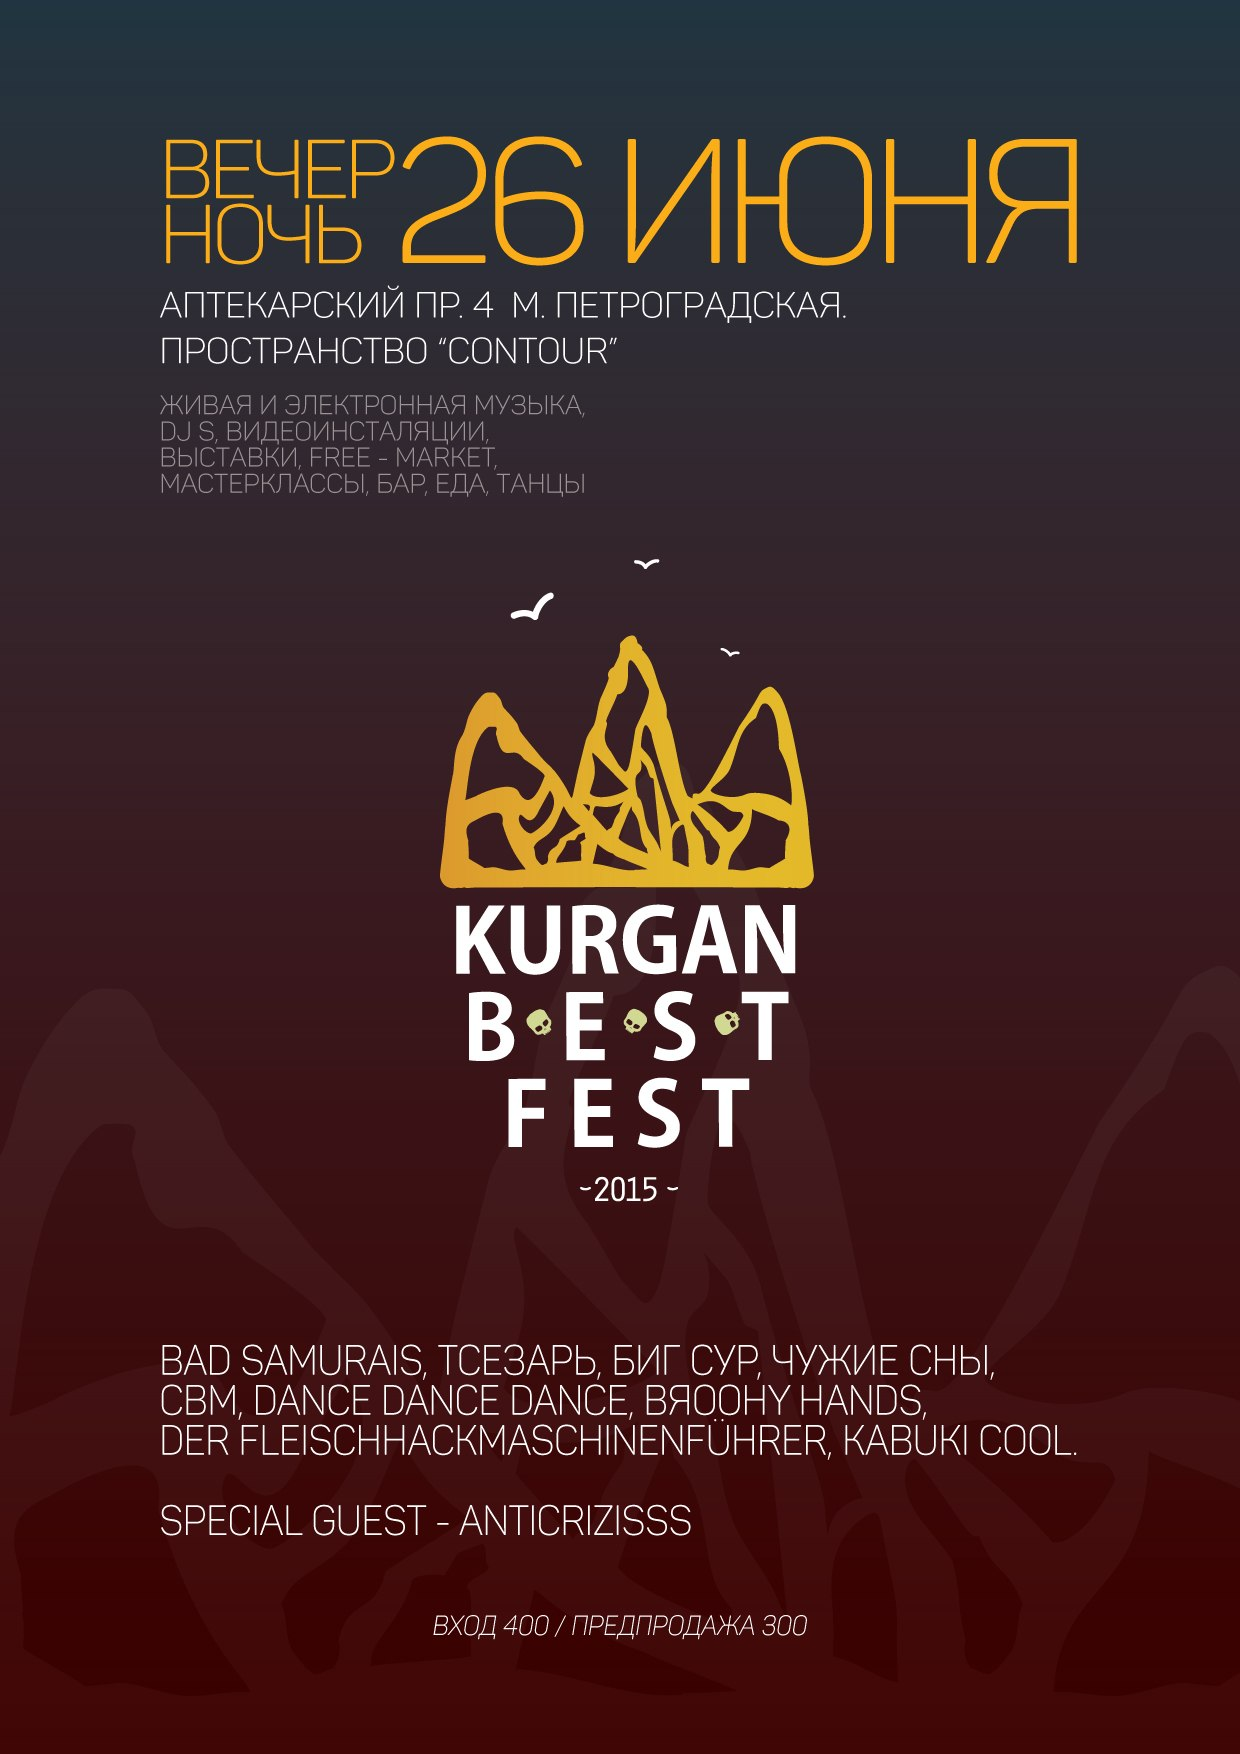 Kurgan Best Fest 2015